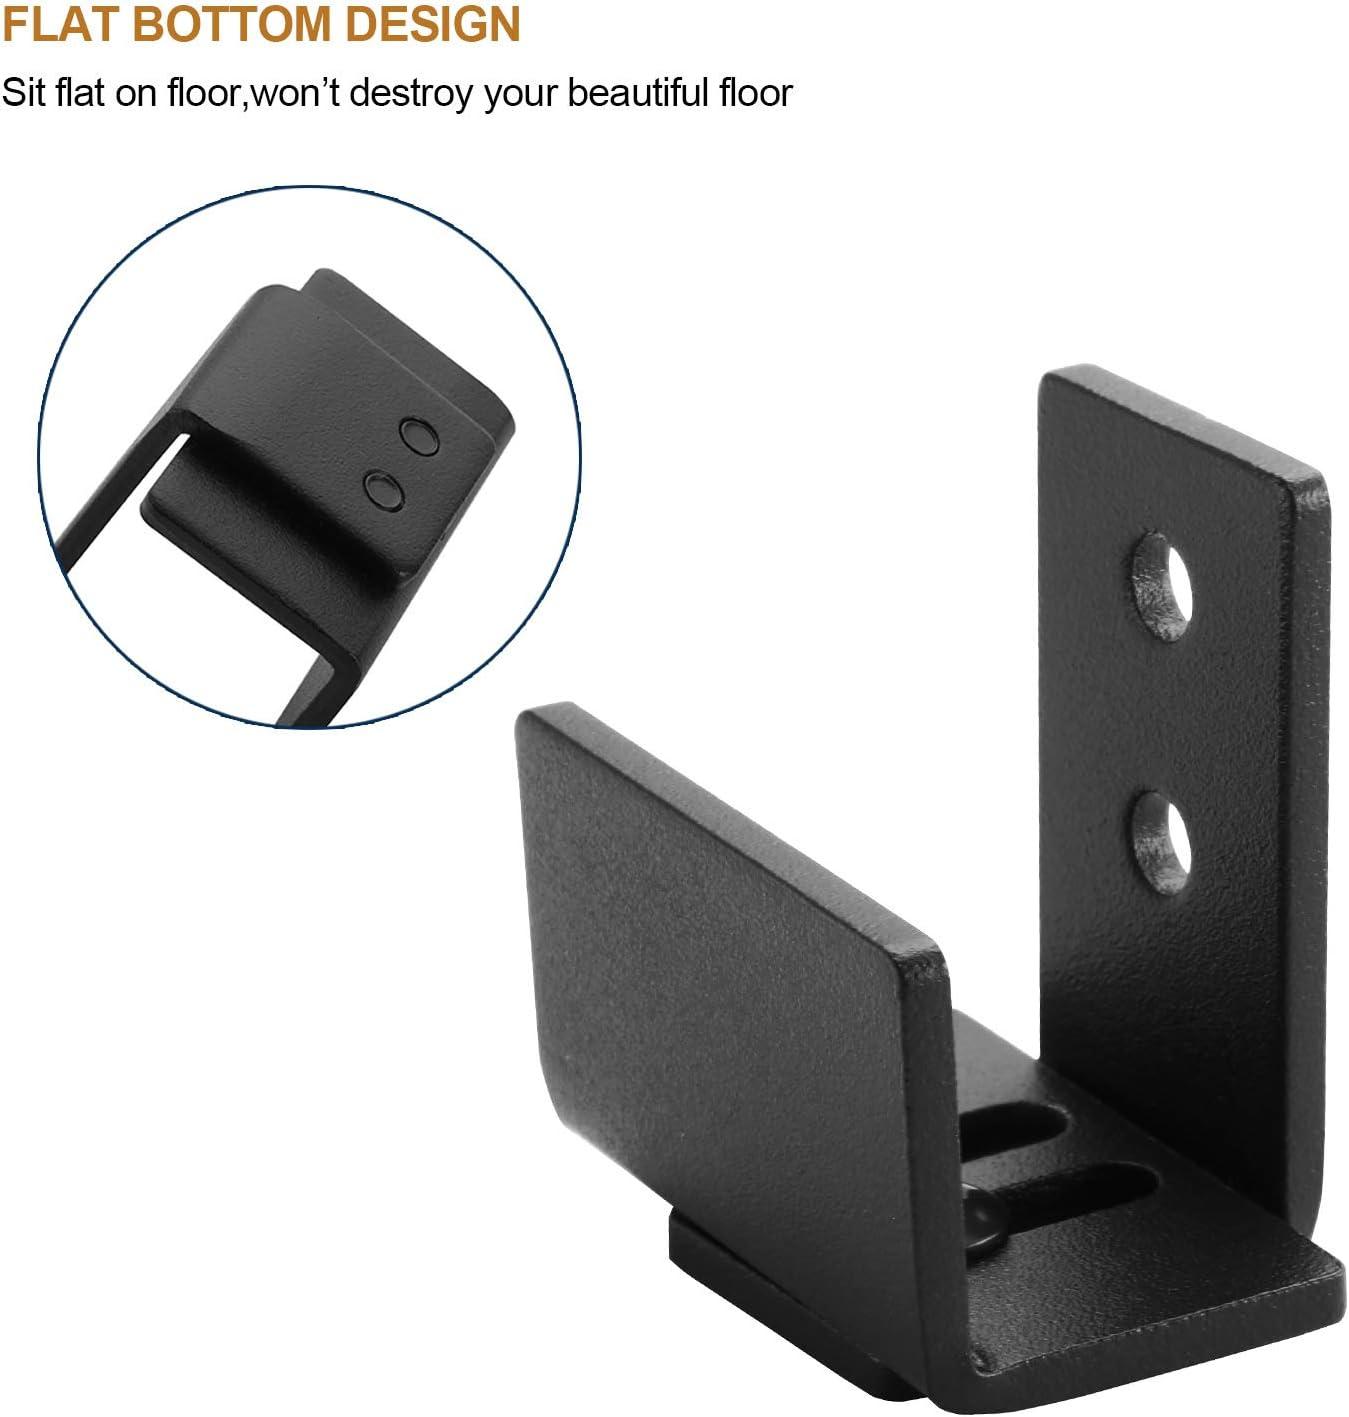 6FT Track Double Door Kit EaseLife 6 FT Super Mini Top Mount Double Door Sliding Barn Door Hardware Track Kit,Easy Install,Slide Smoothly Quietly,Apply for Cabinet Window TV Closet No Cabinet